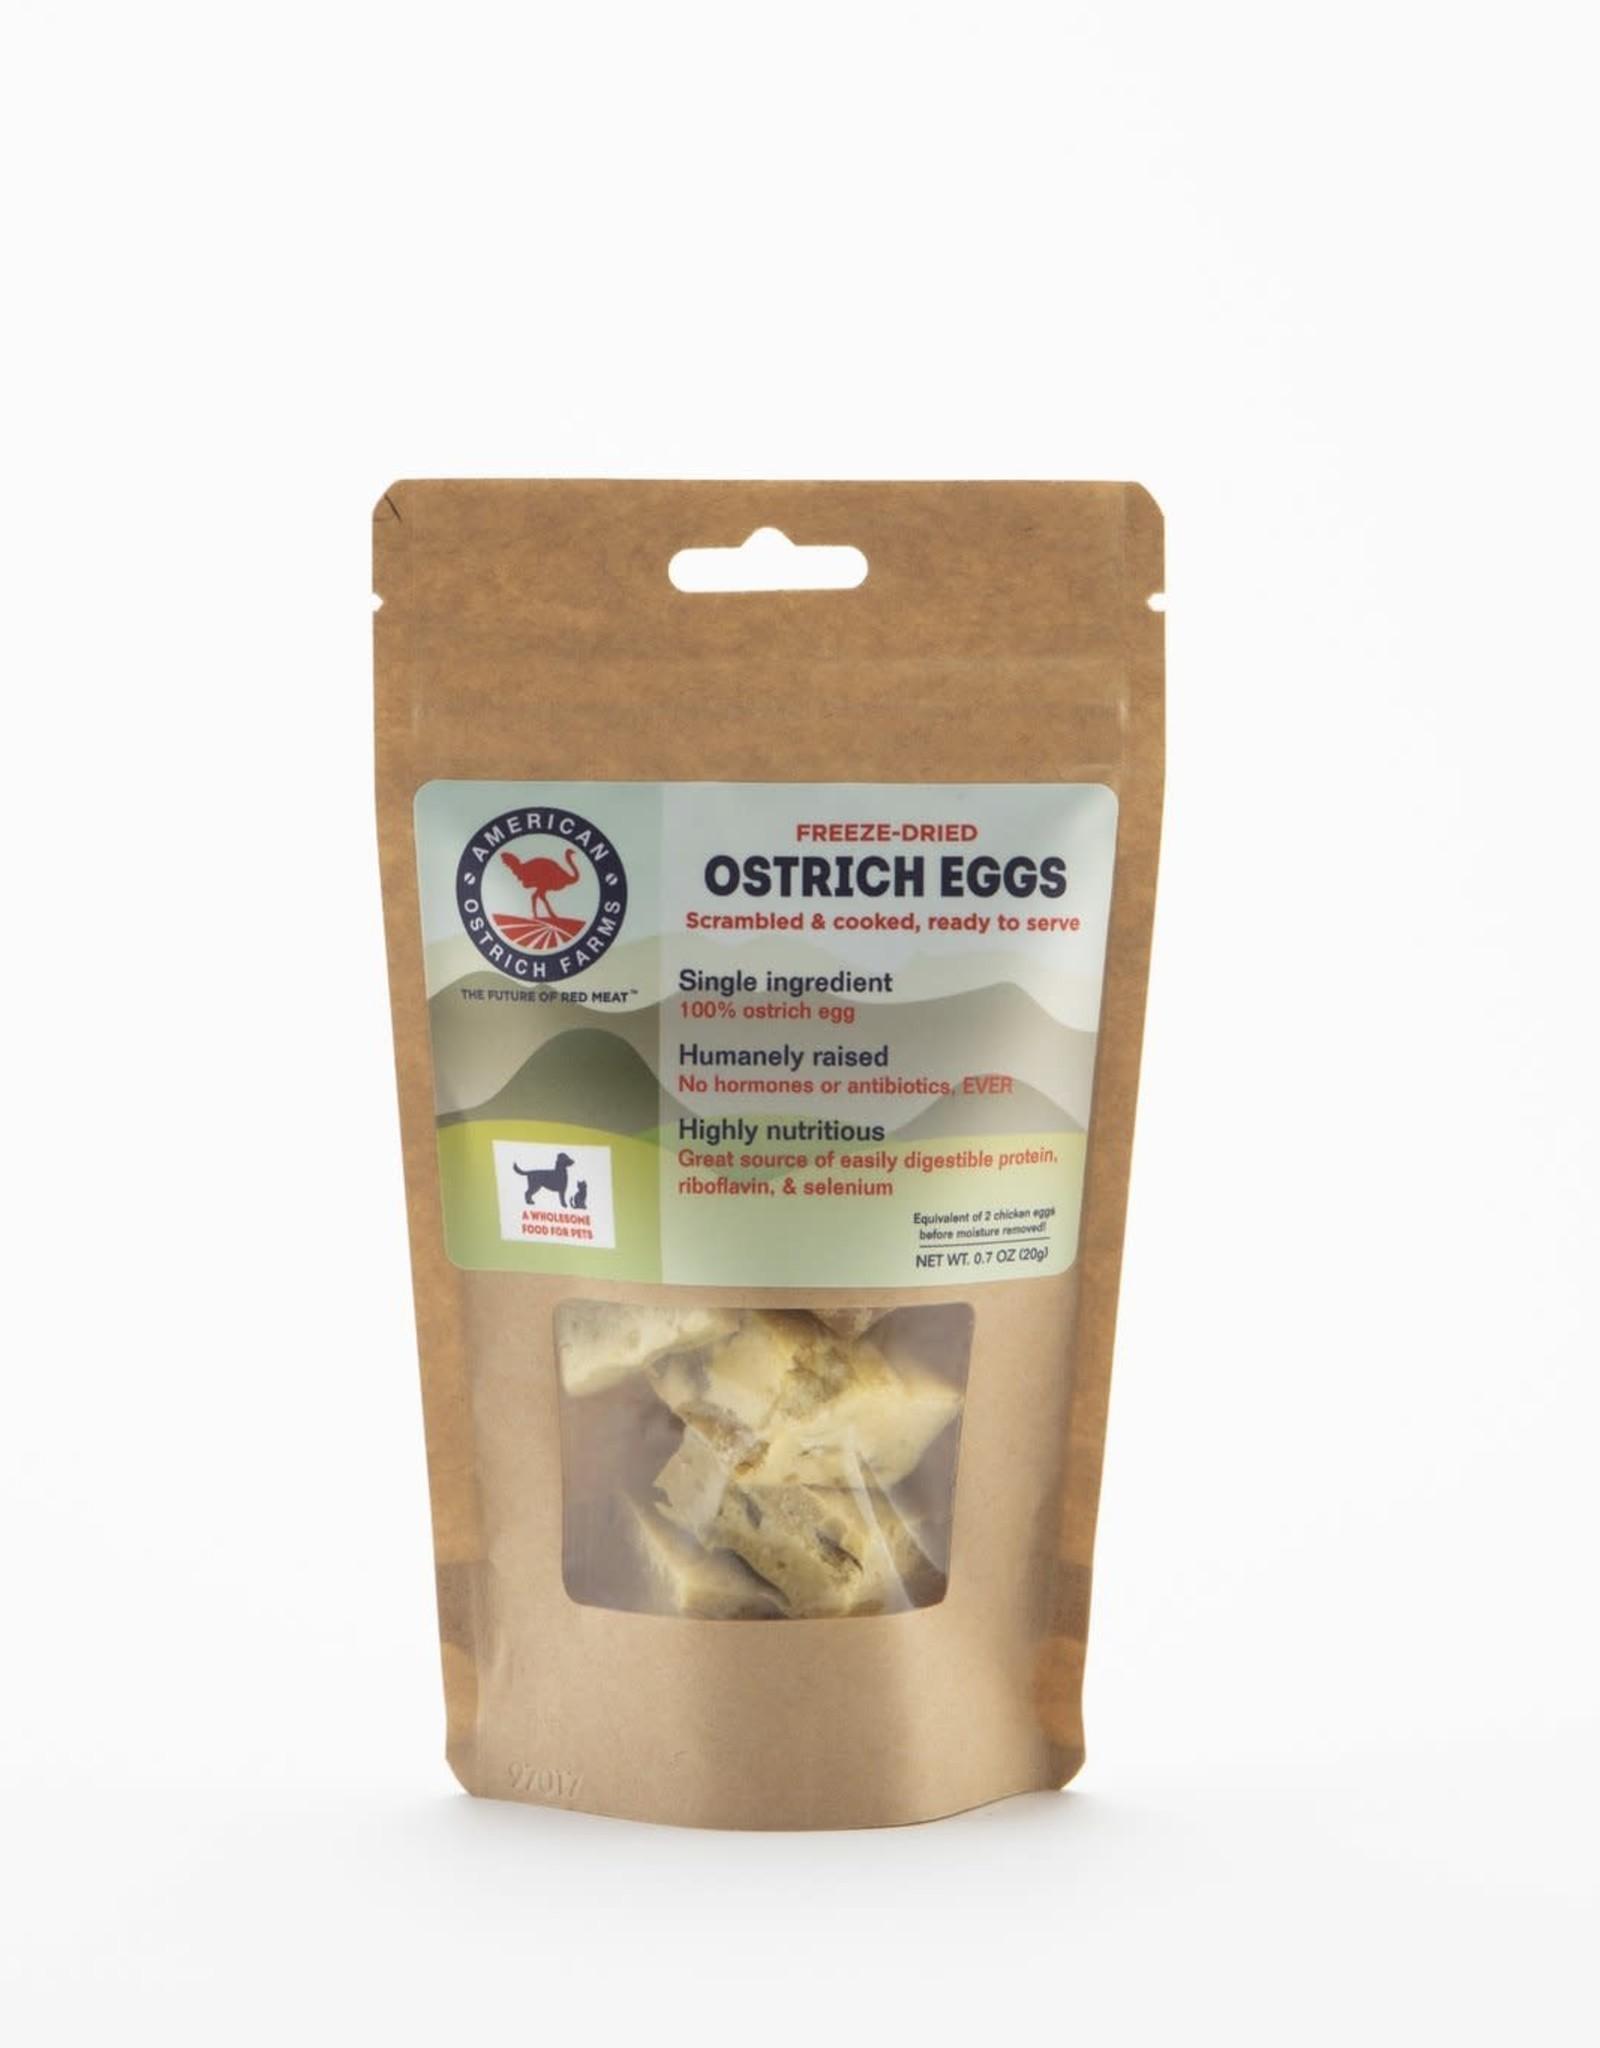 American Ostrich Farm Ostrich Freeze-Dried Eggs